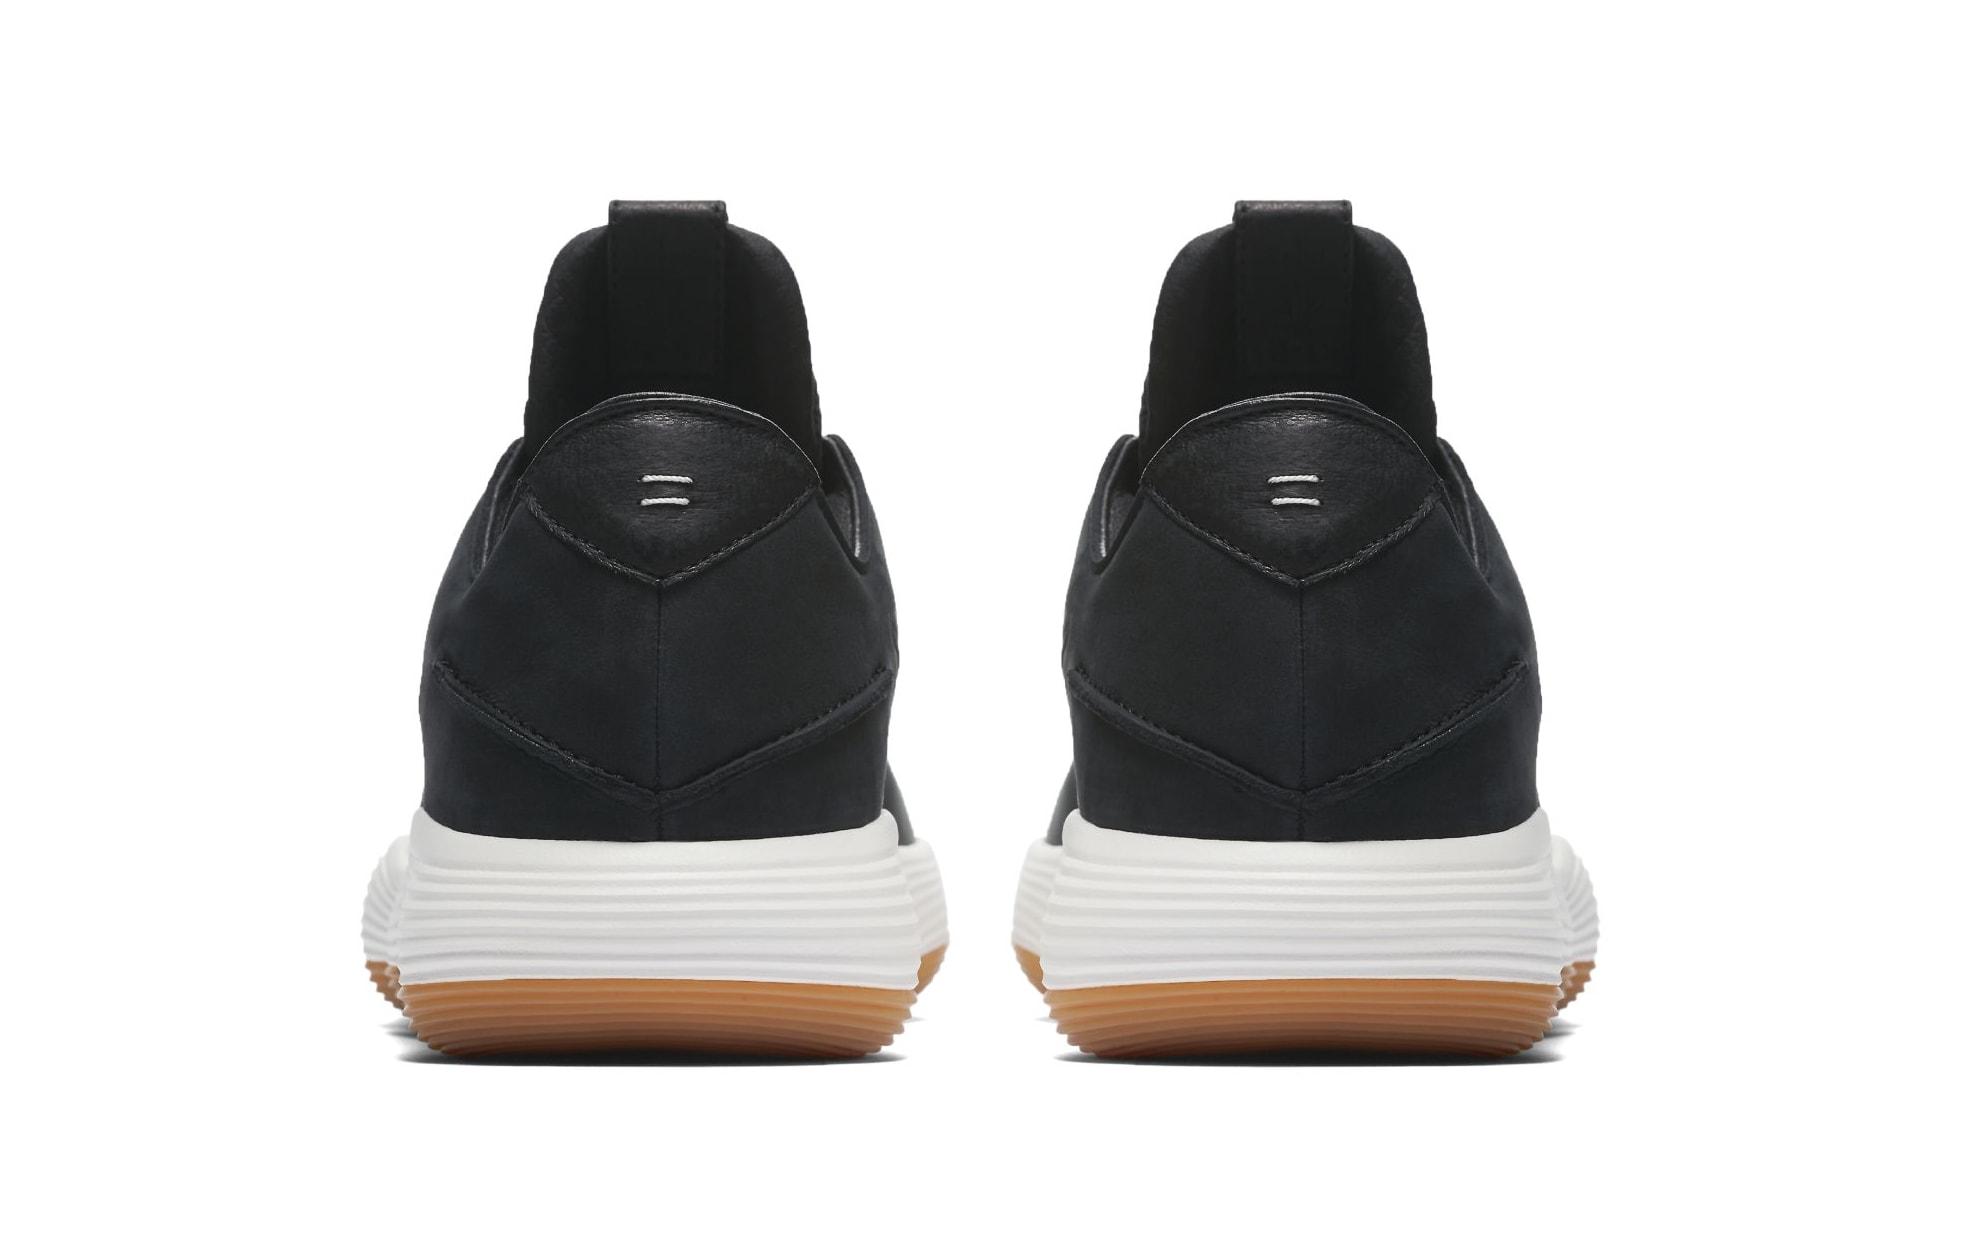 Nike Hyperdunk 2017 Low Lifestyle Black (Heel)